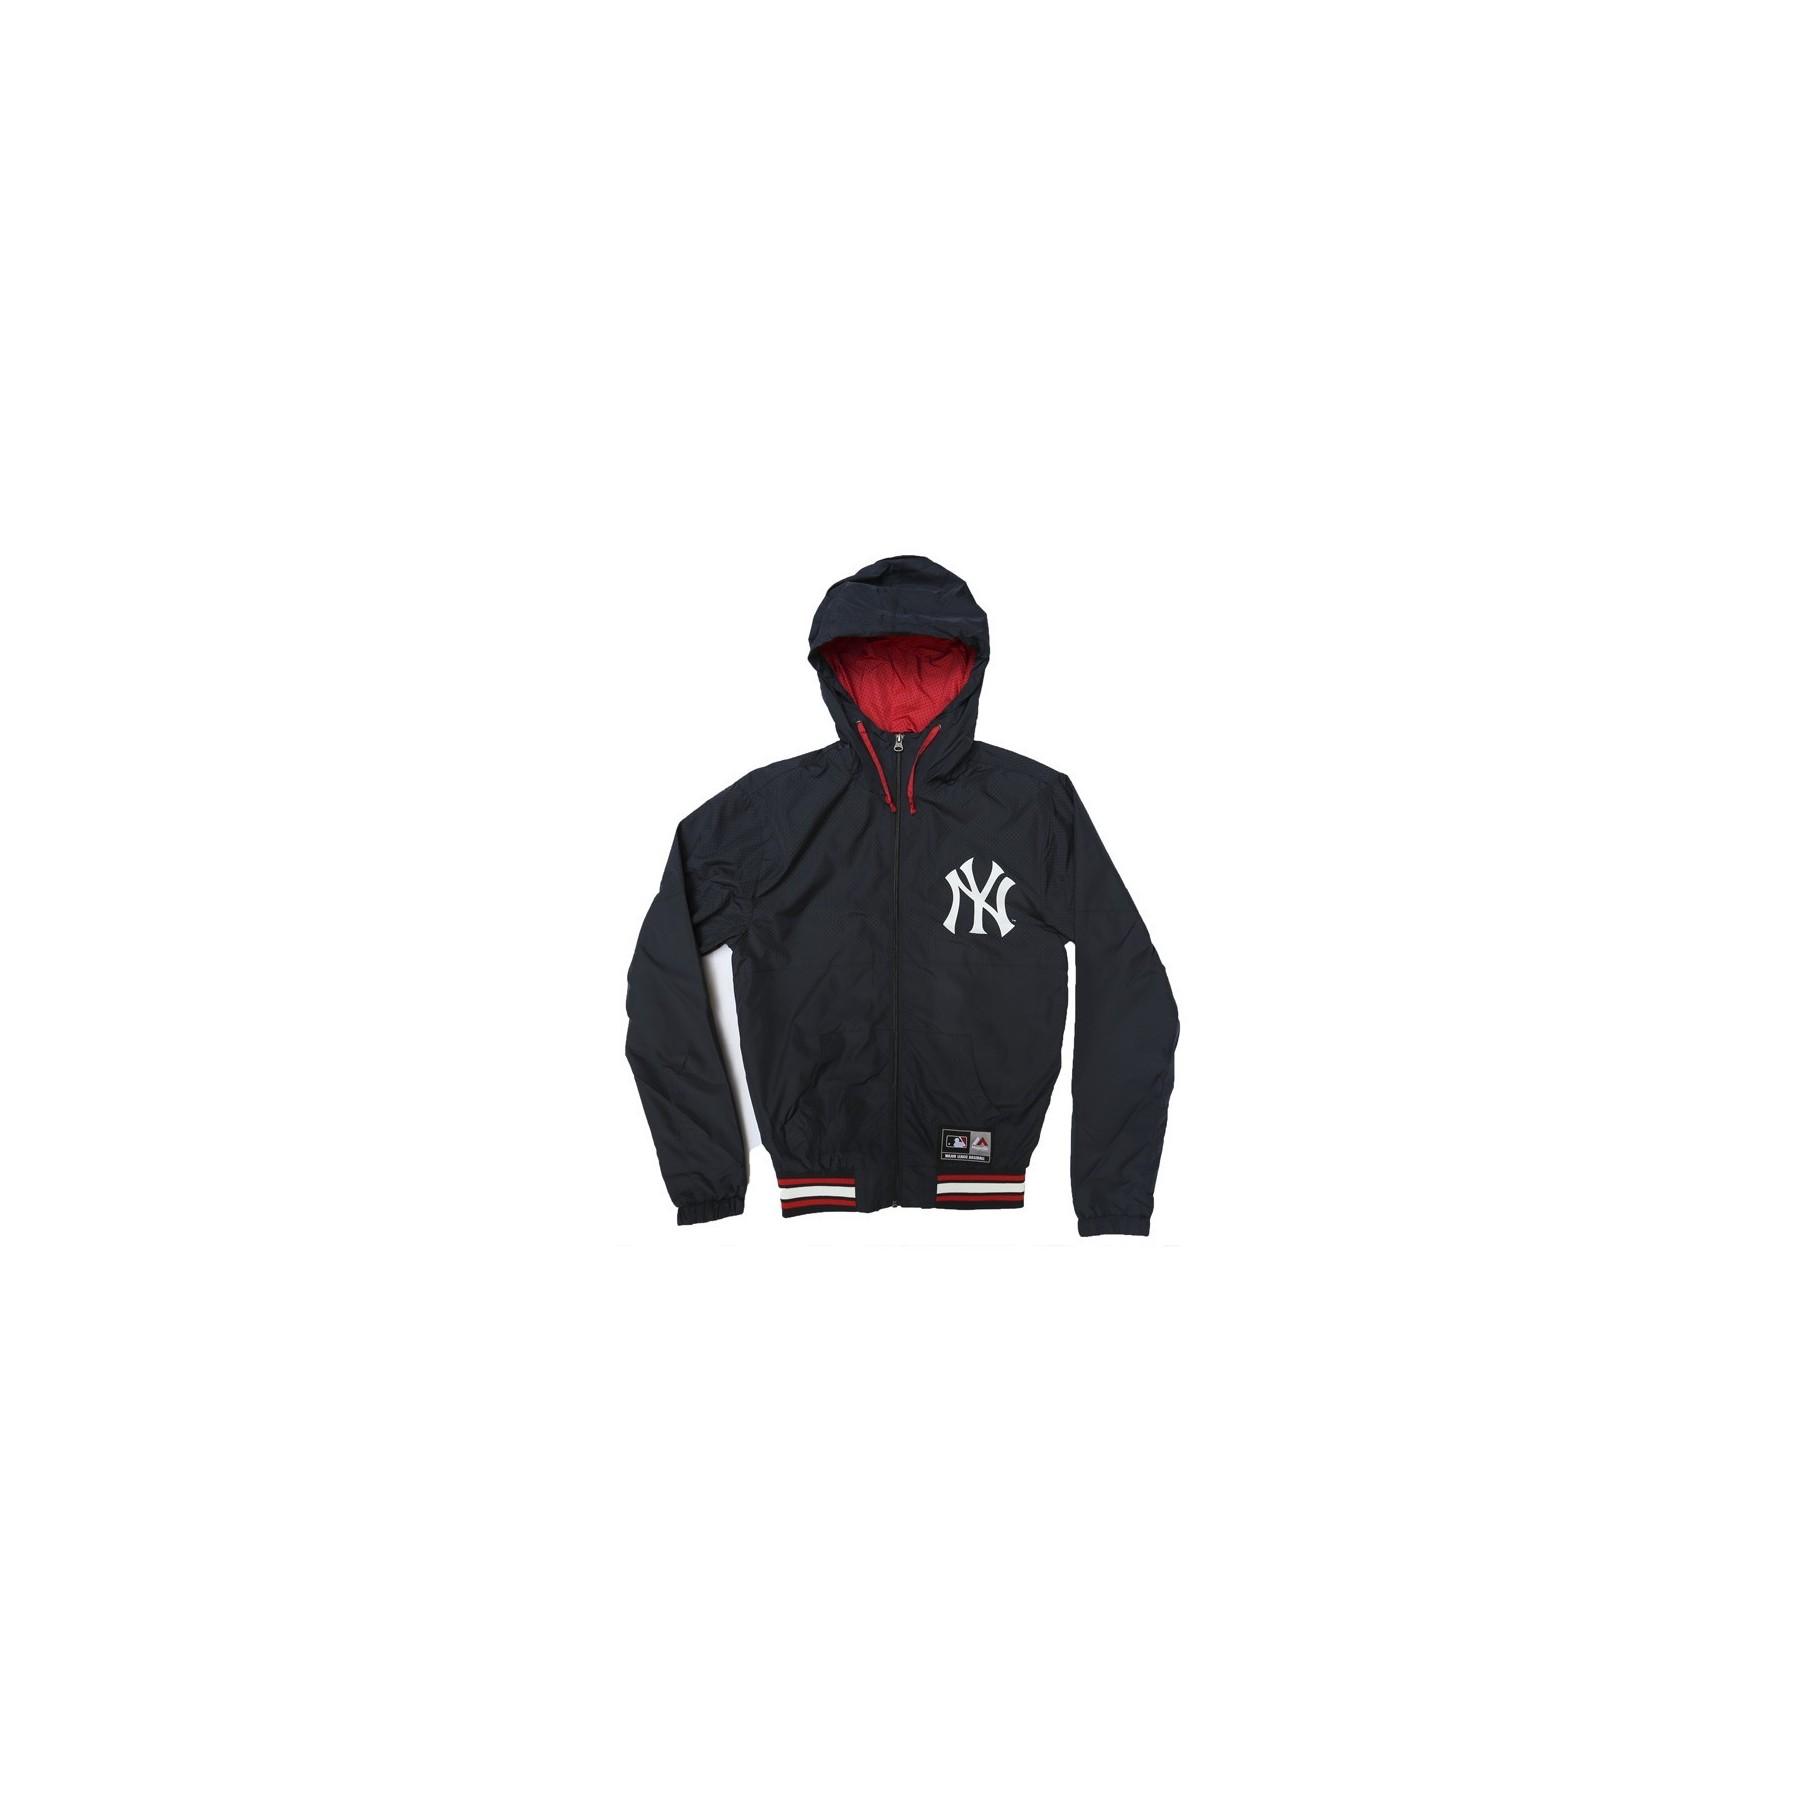 new style 020ac d6802 GIUBBOTTO MAJESTIC JACKET WINDBREAKER PERFORATED MLB NEW YORK YANKEES  Navy/Red unico | Atipicishop.com